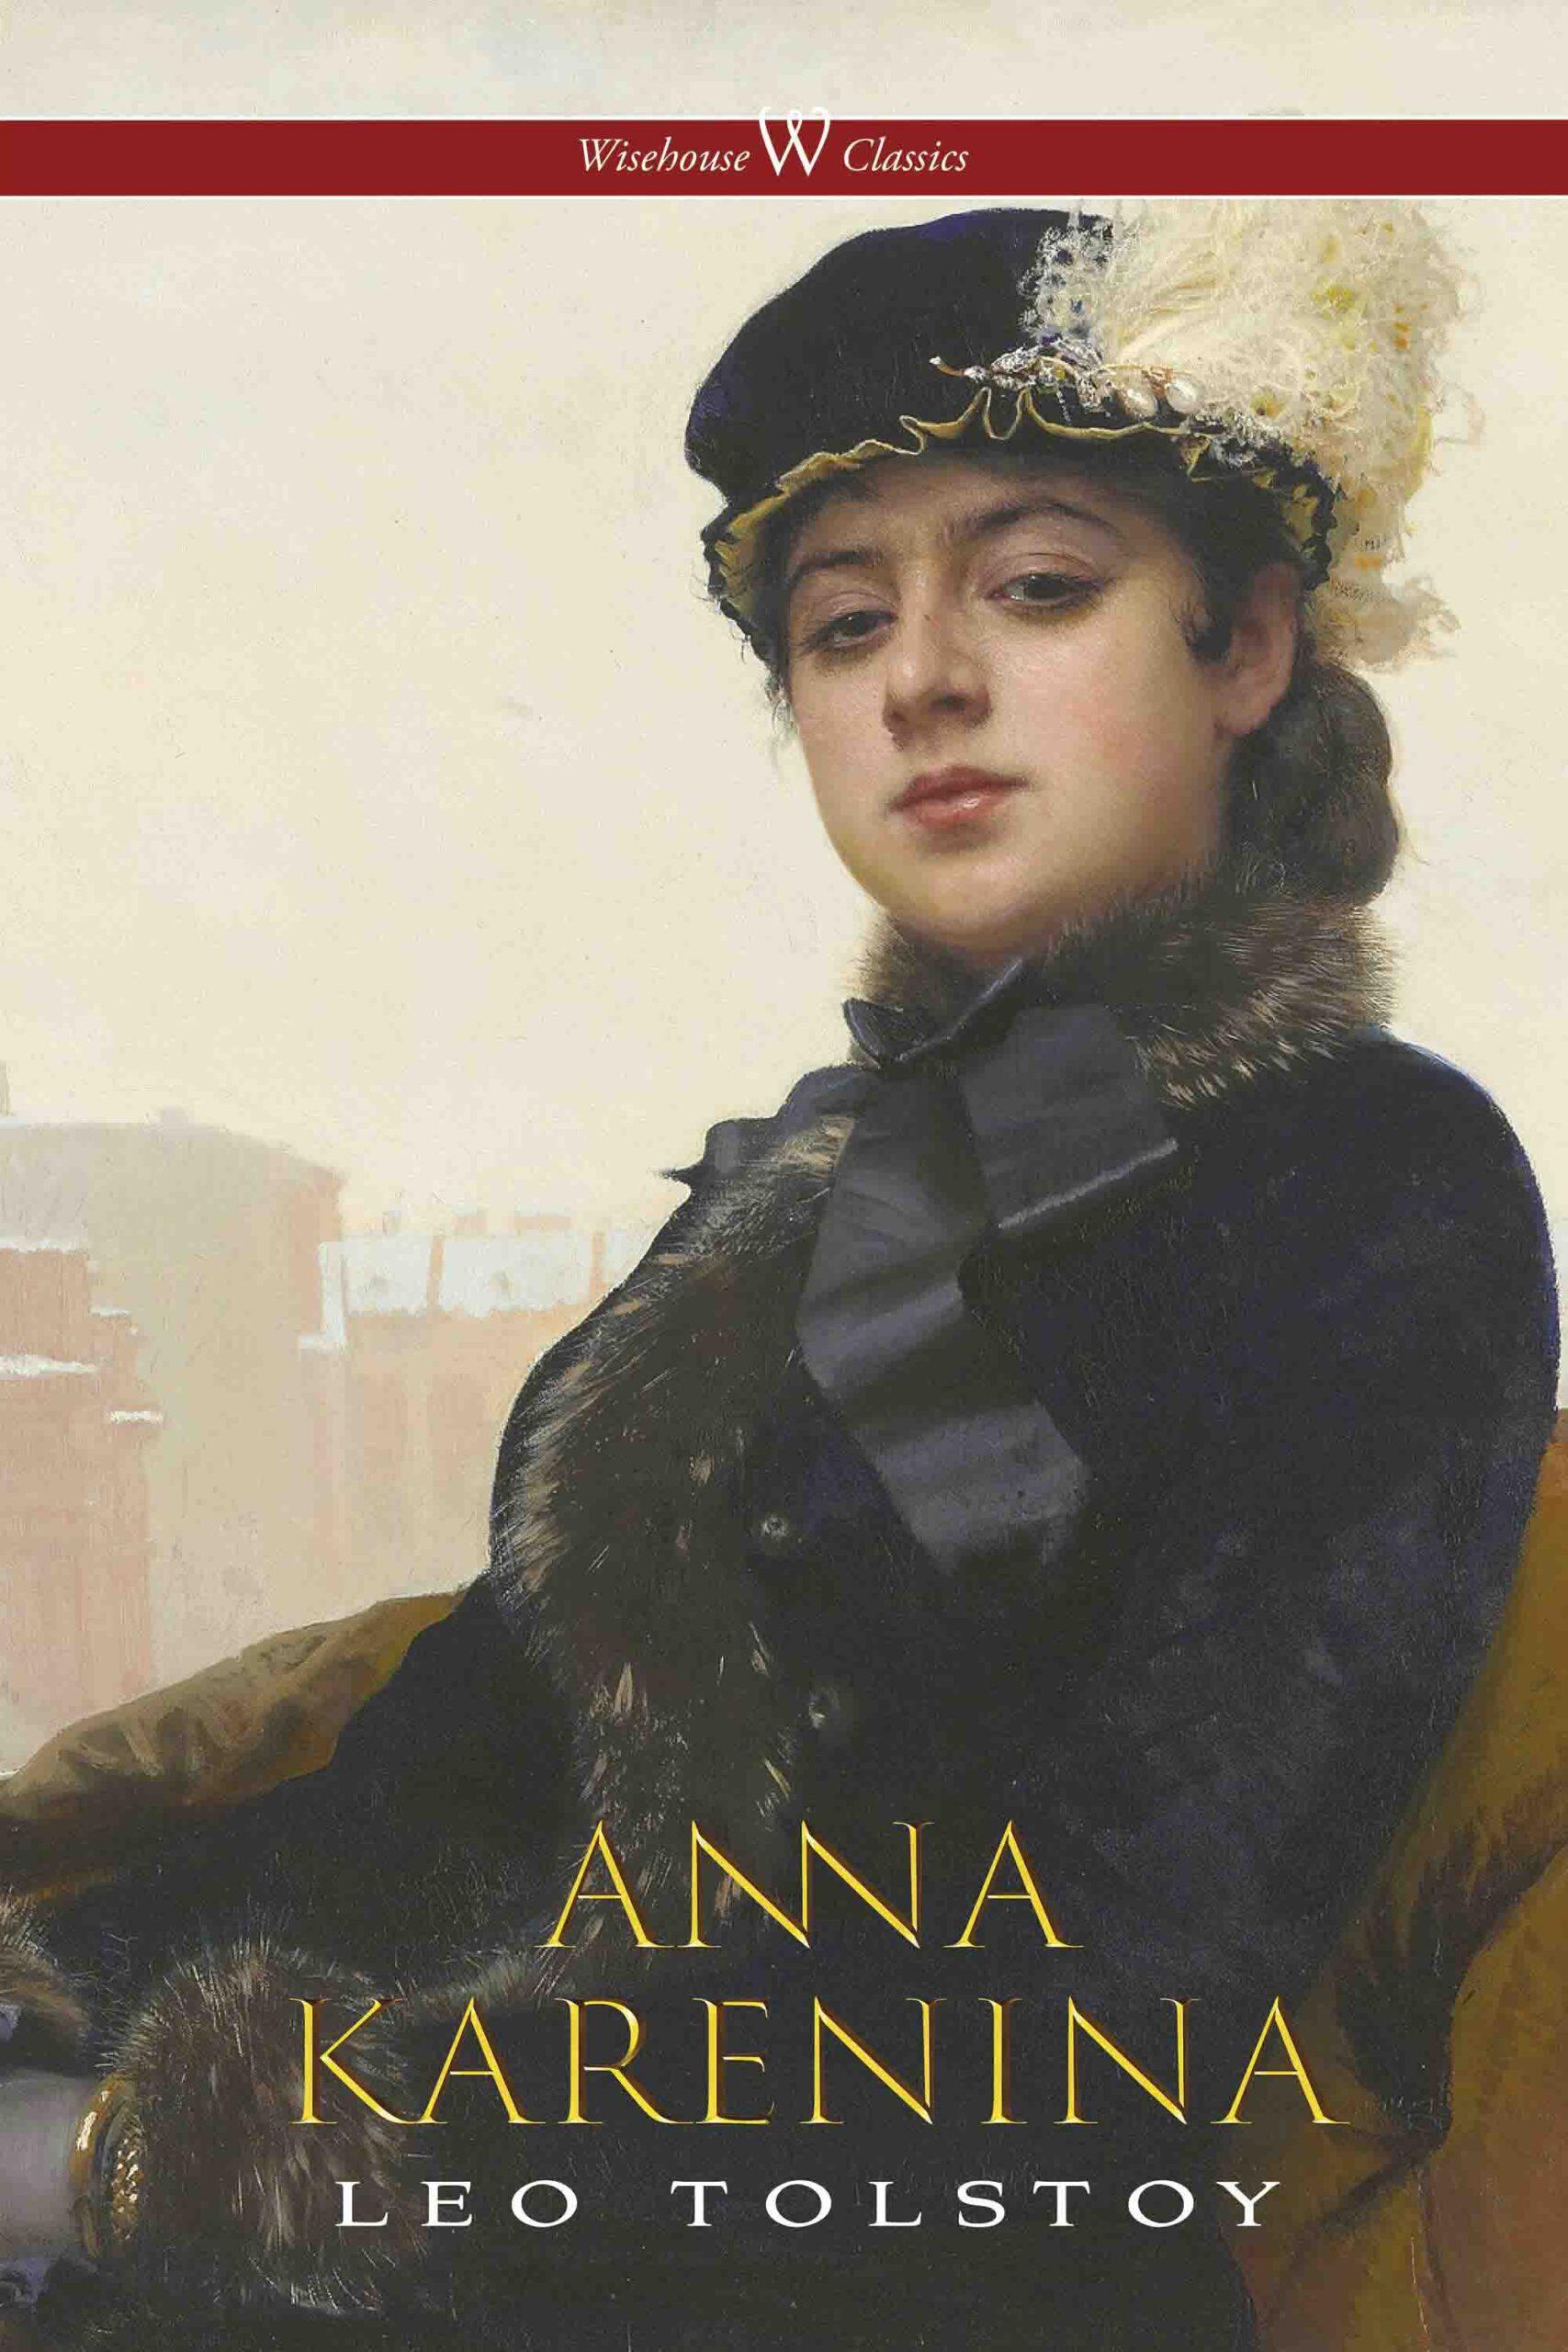 Anna Karenina (Wisehouse Classics Edition)